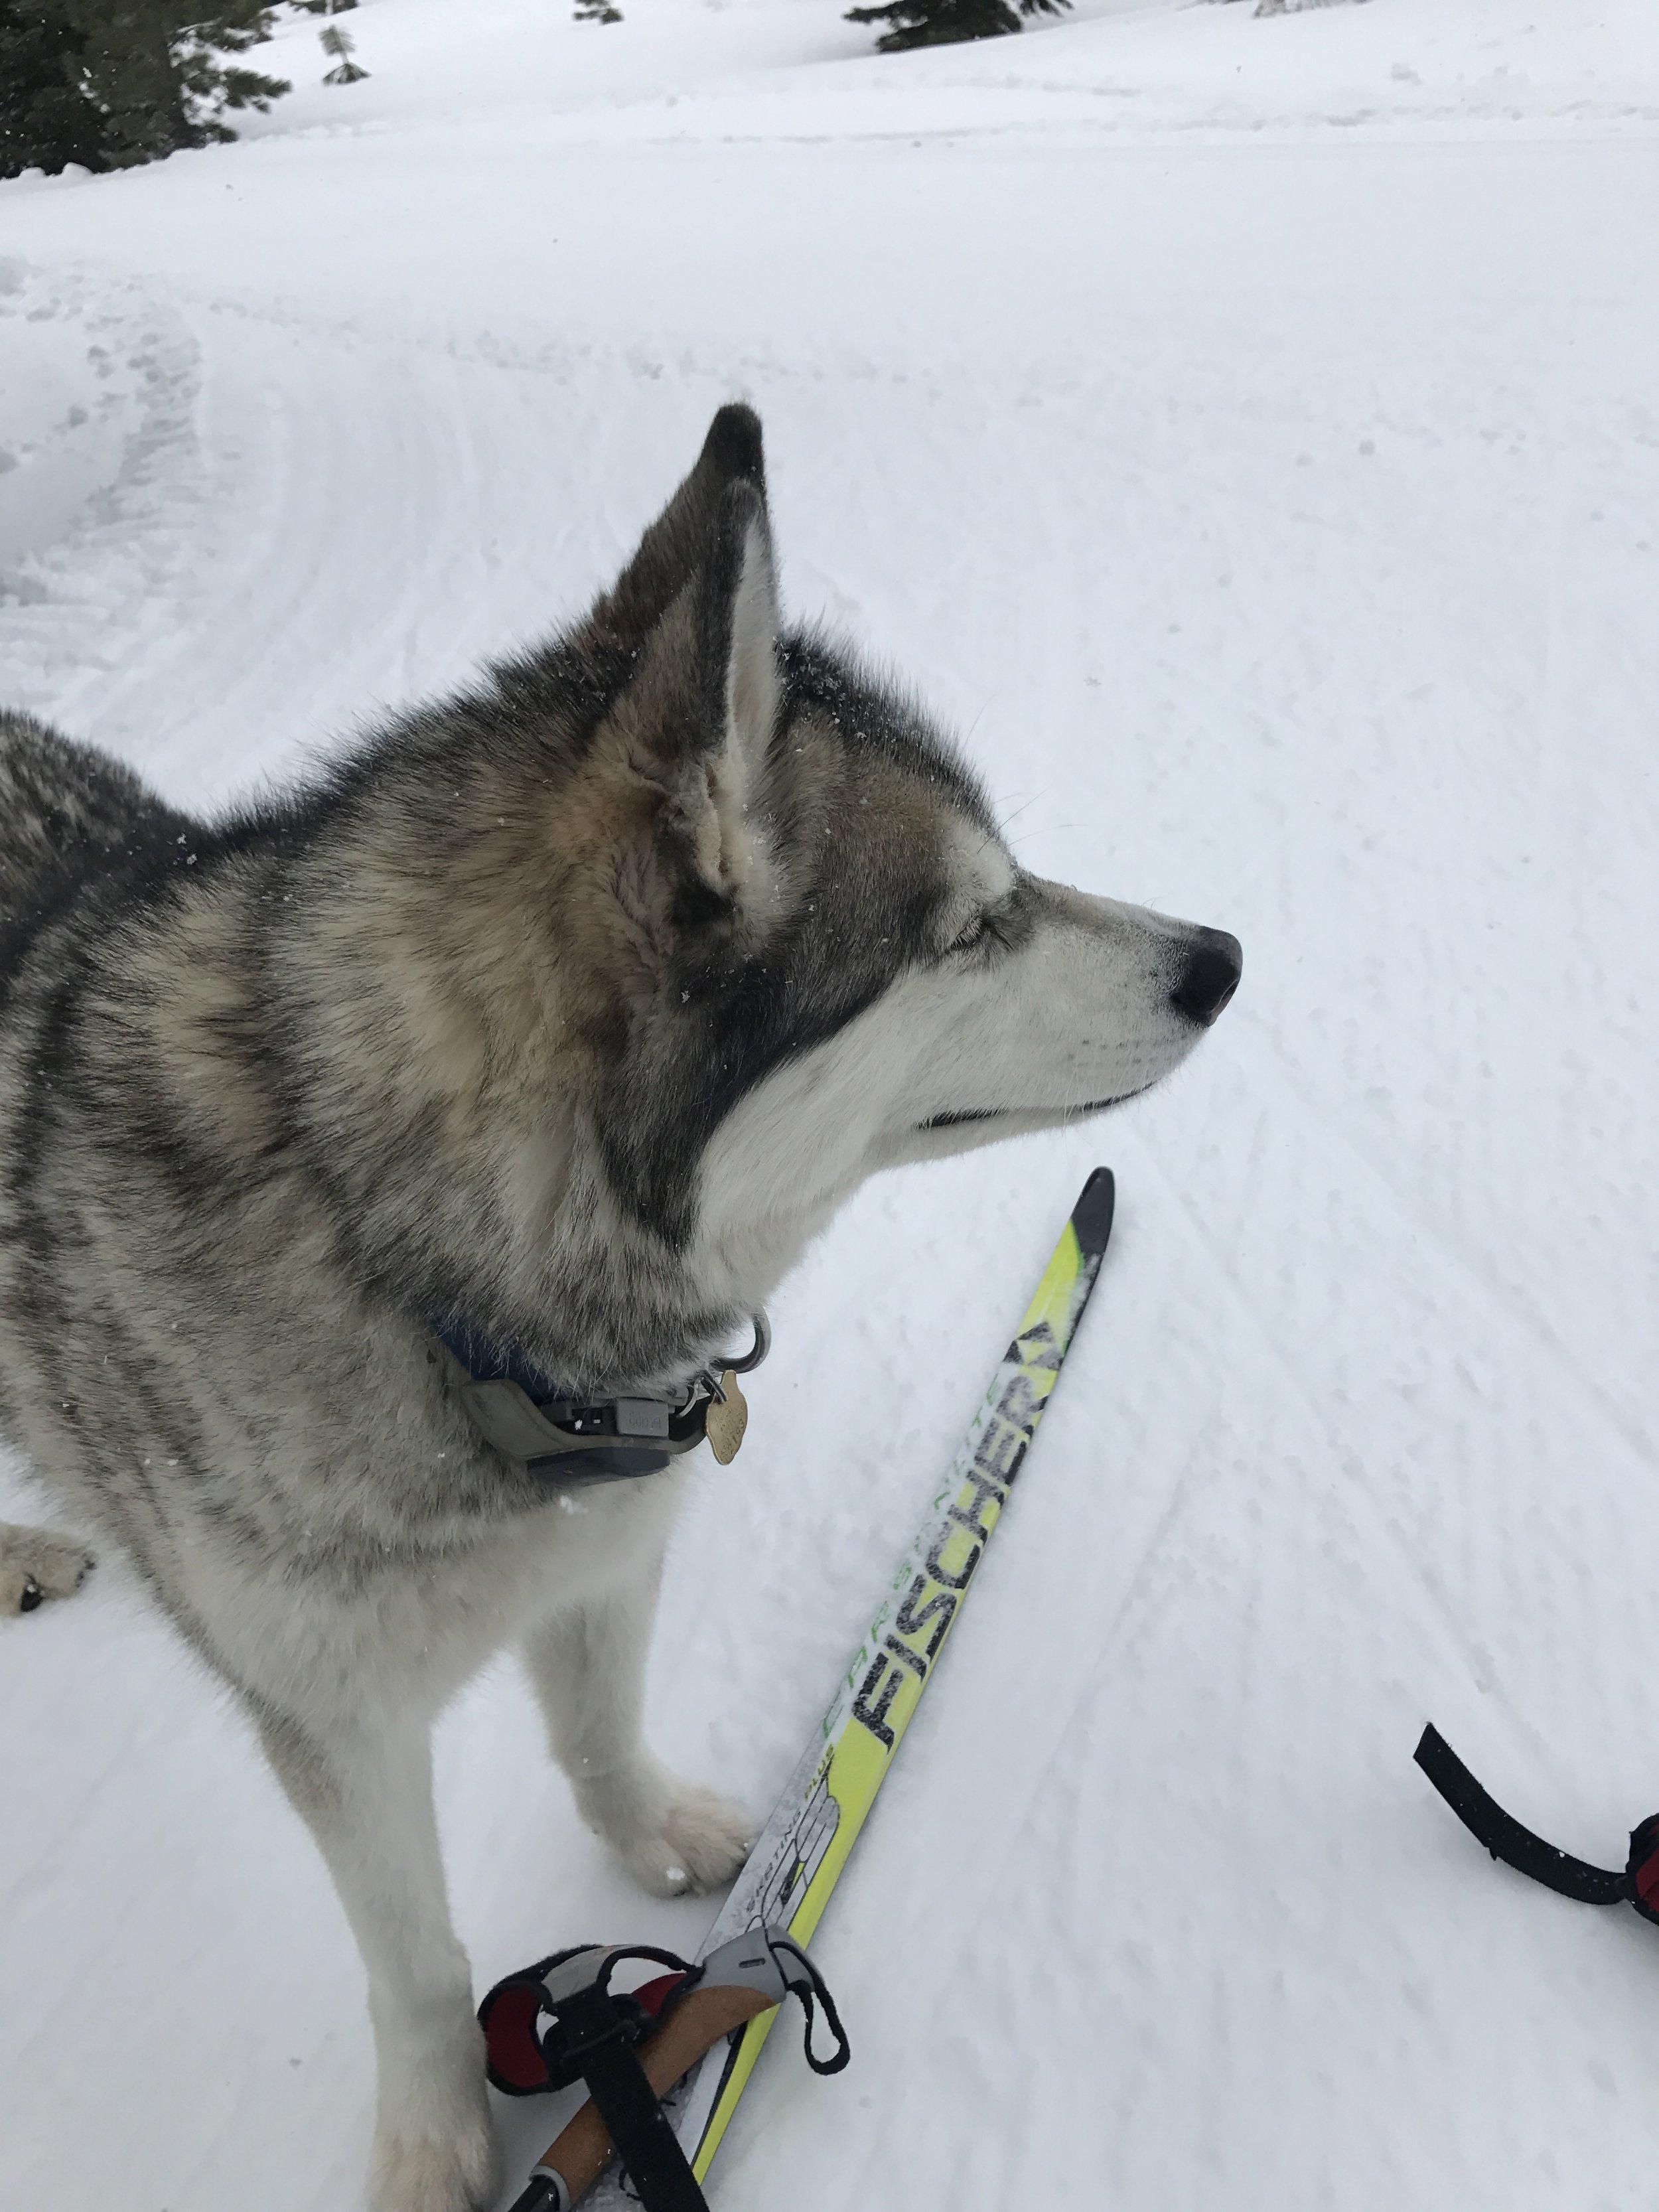 Luna enjoyed ski season too!